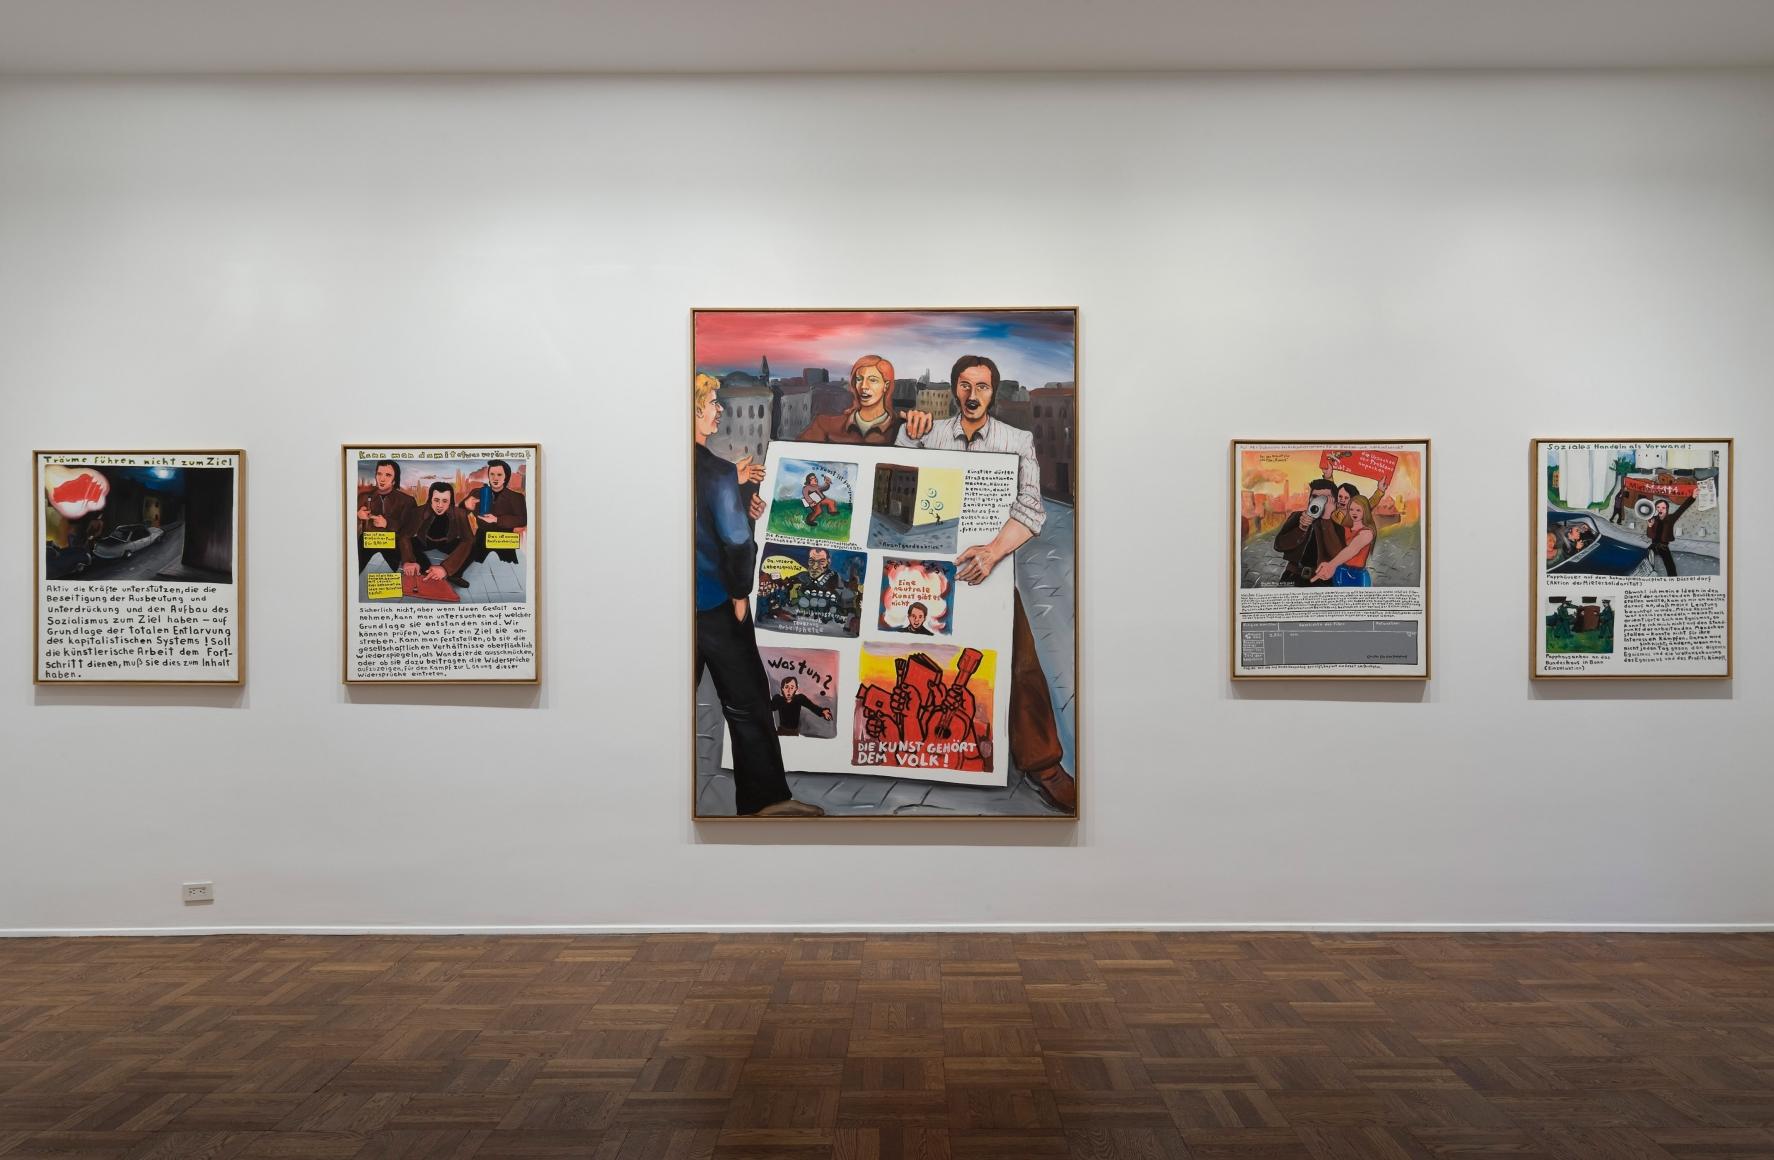 JÖRG IMMENDORFF, Maoist Paintings - The Early Seventies, 2009, Michael Werner New York Image 3